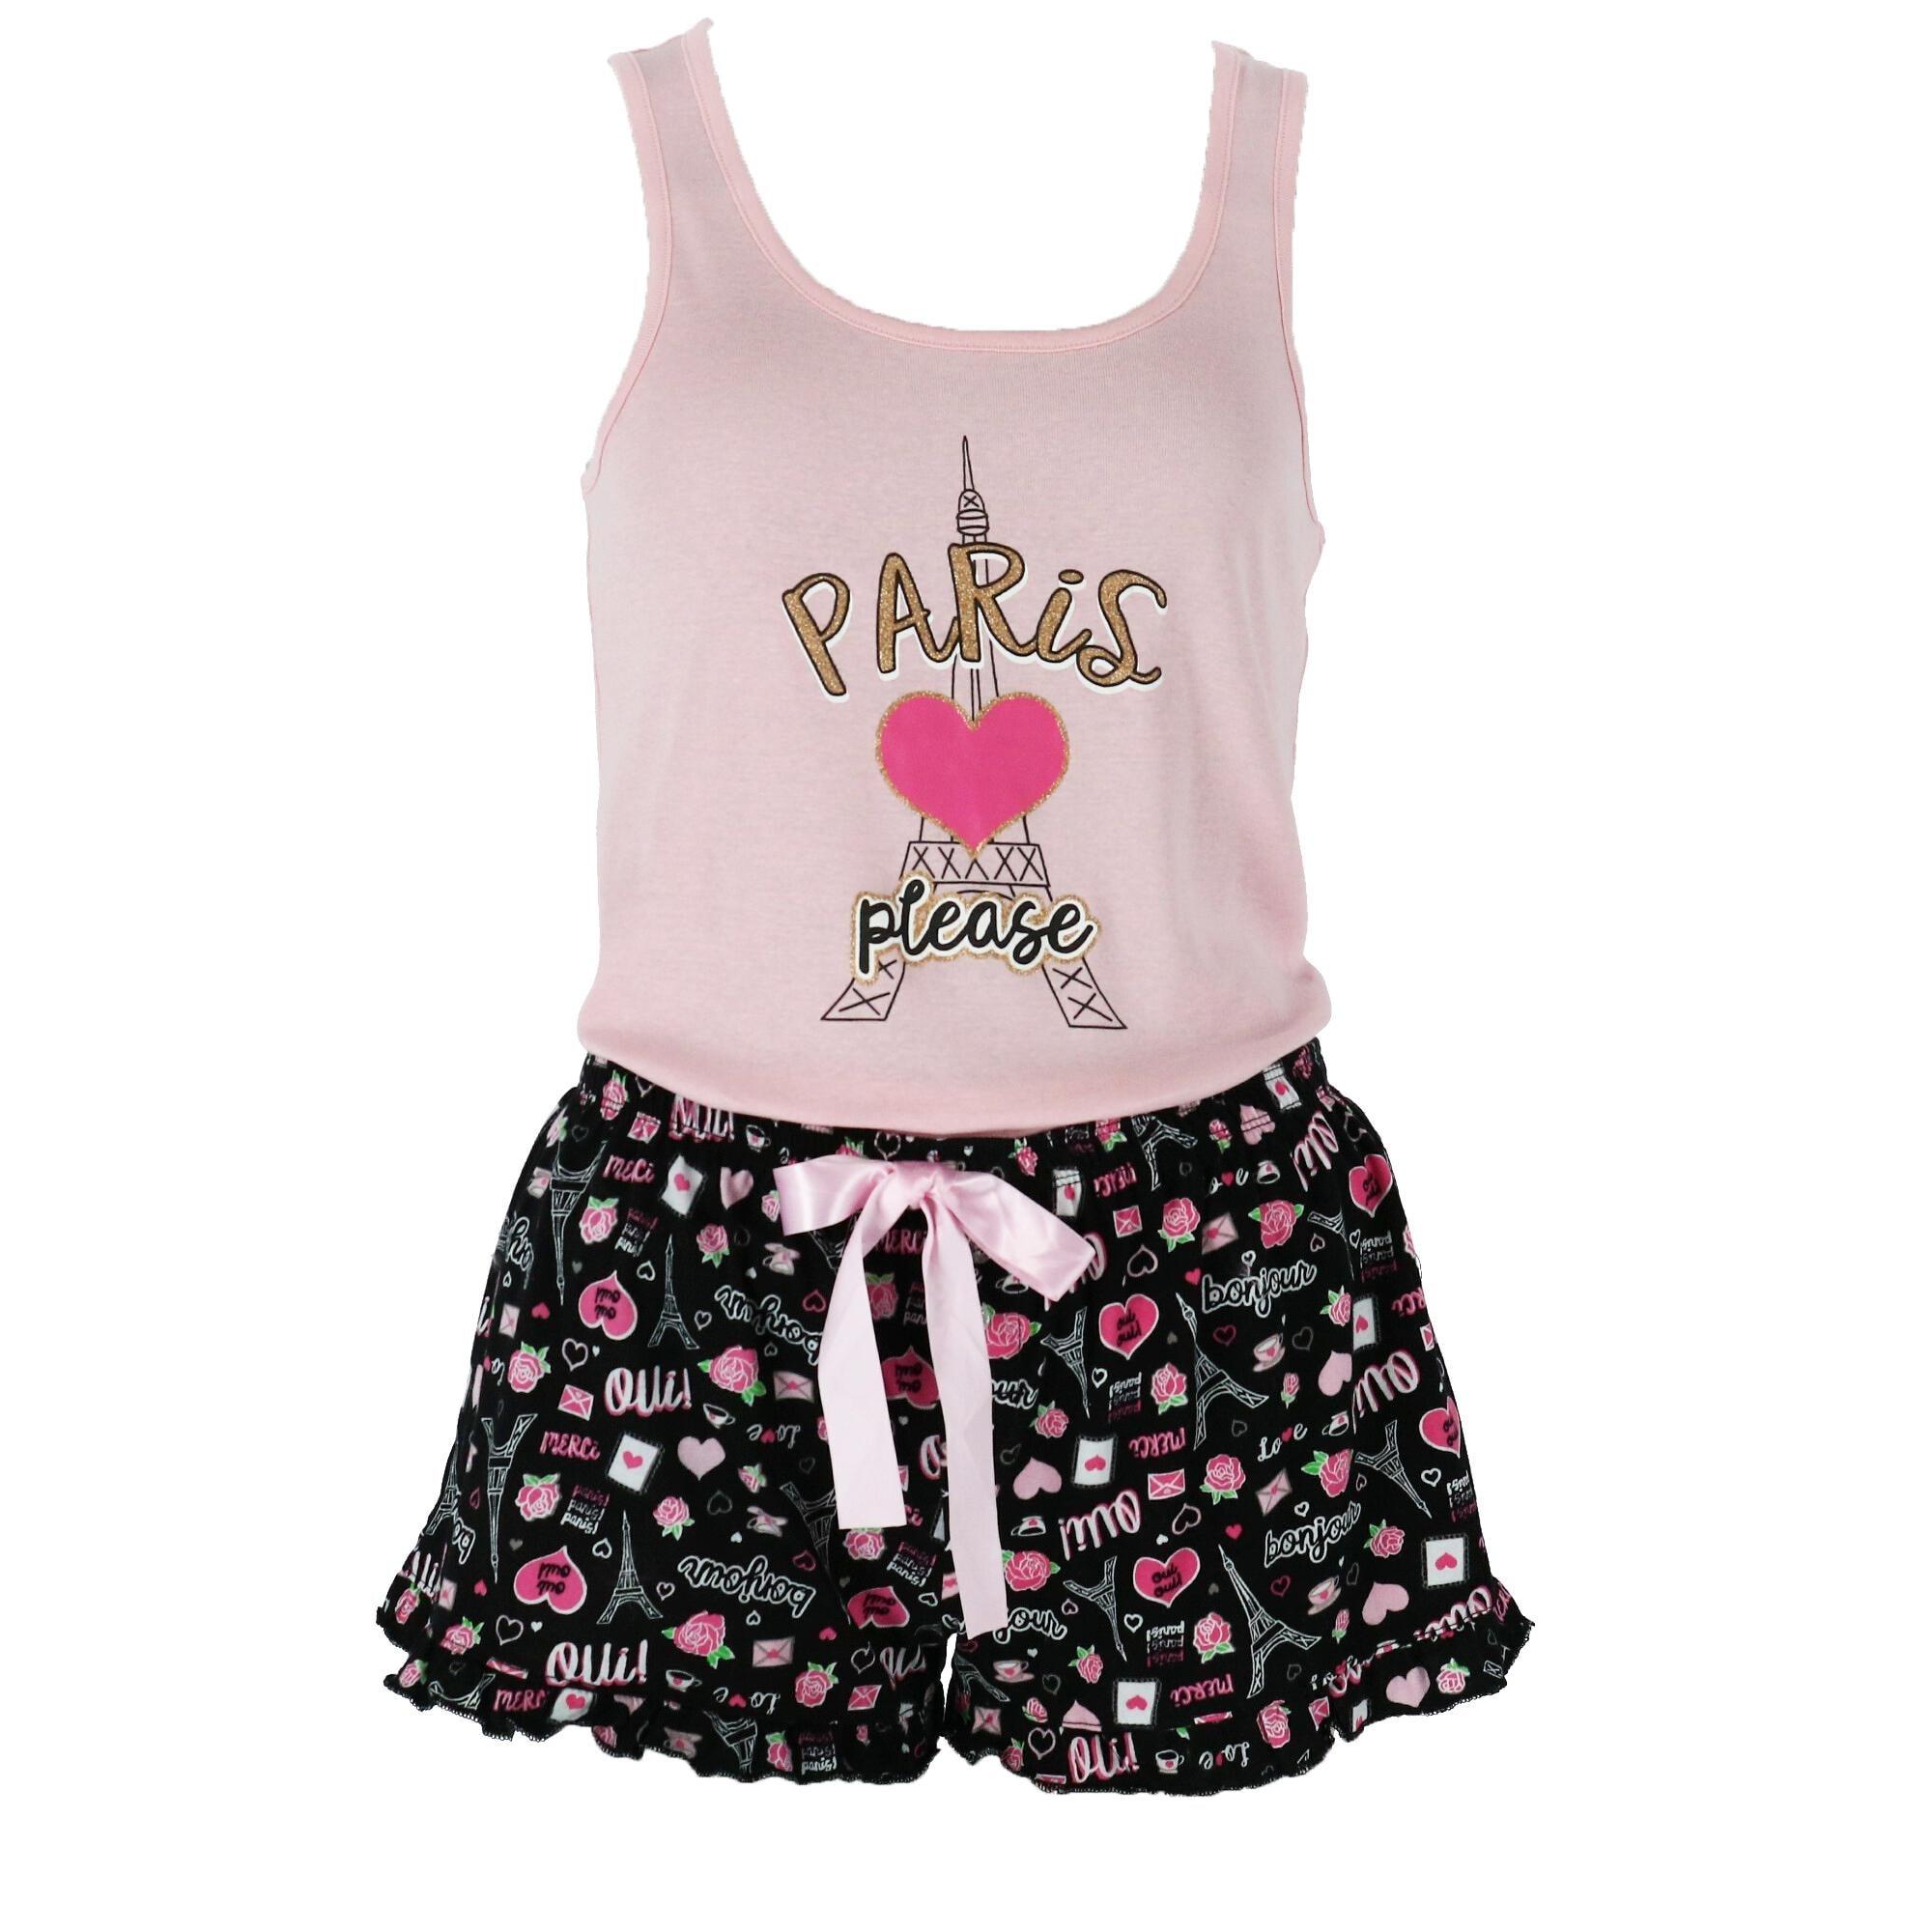 2e866f49446 LaLa Sleepwear Juniors Ruffle Short and Tank Pajama Set